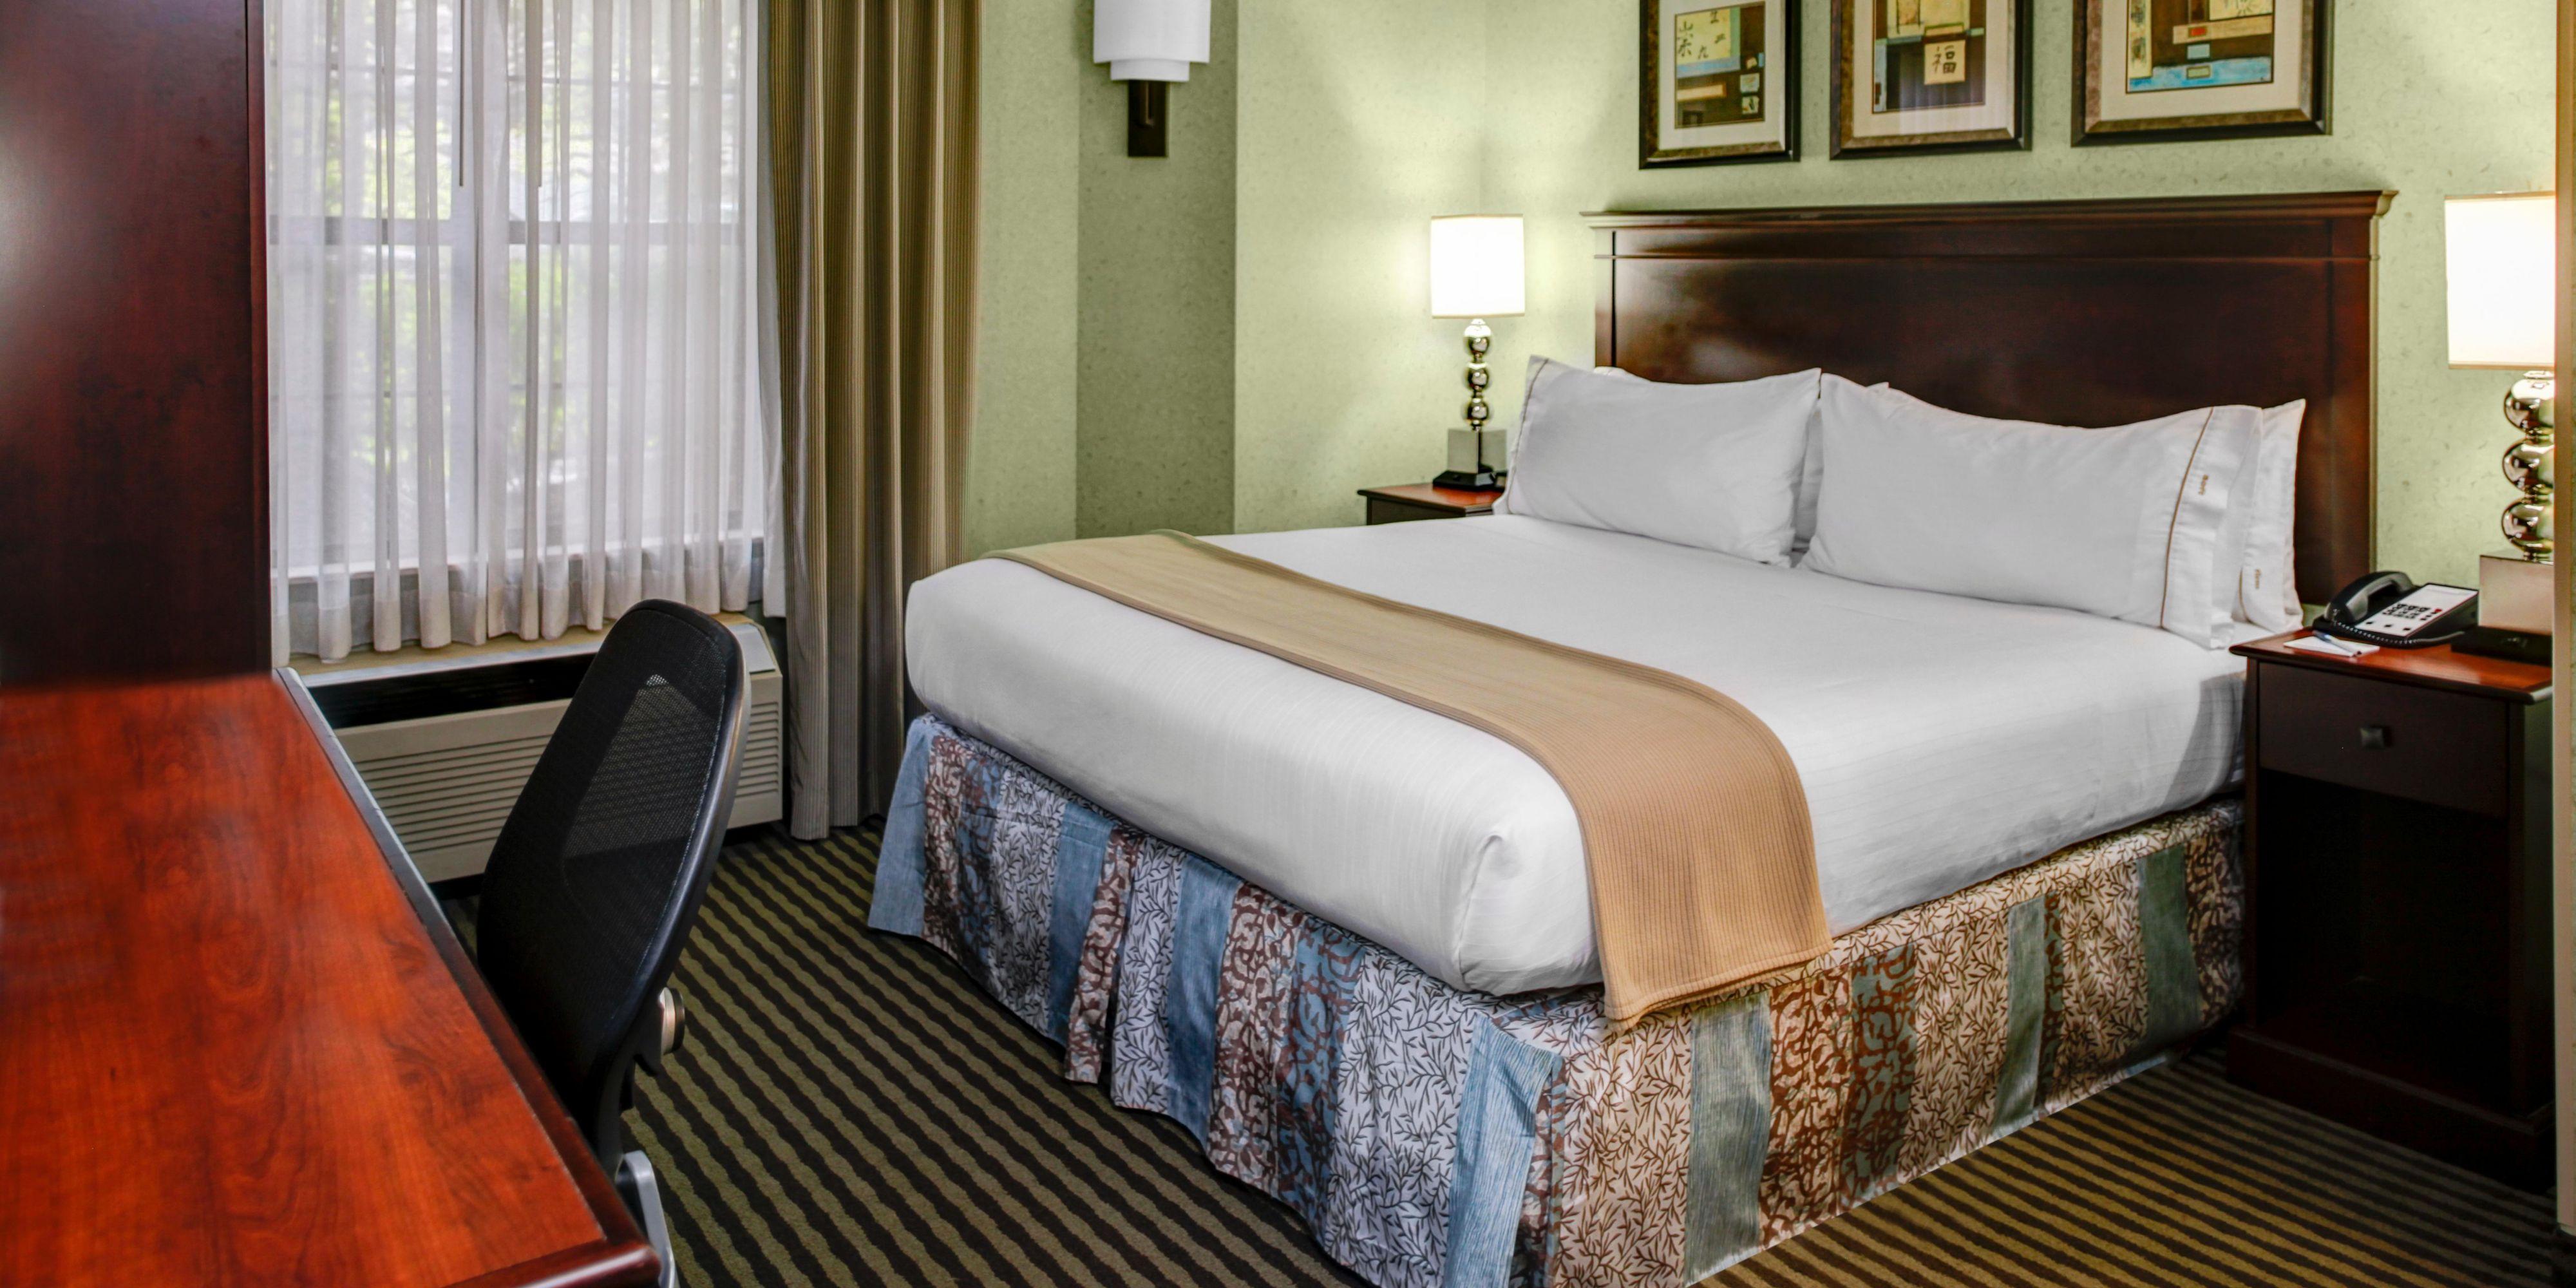 Holiday Inn Express Holiday Inn Express & Suites Atlanta Buckhead